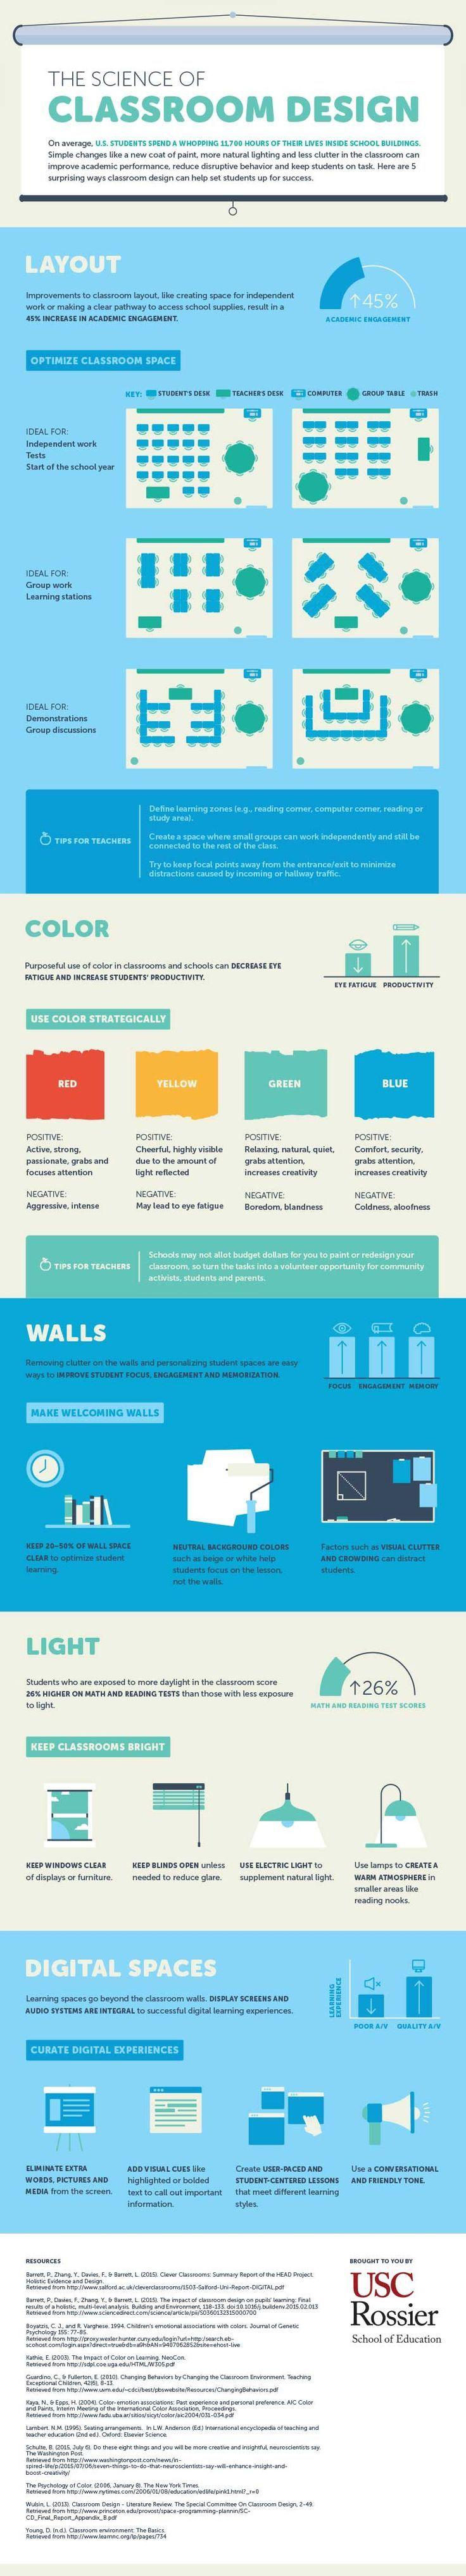 Innovative Classroom Design Ideas ~ Best ideas about classroom seating arrangements on